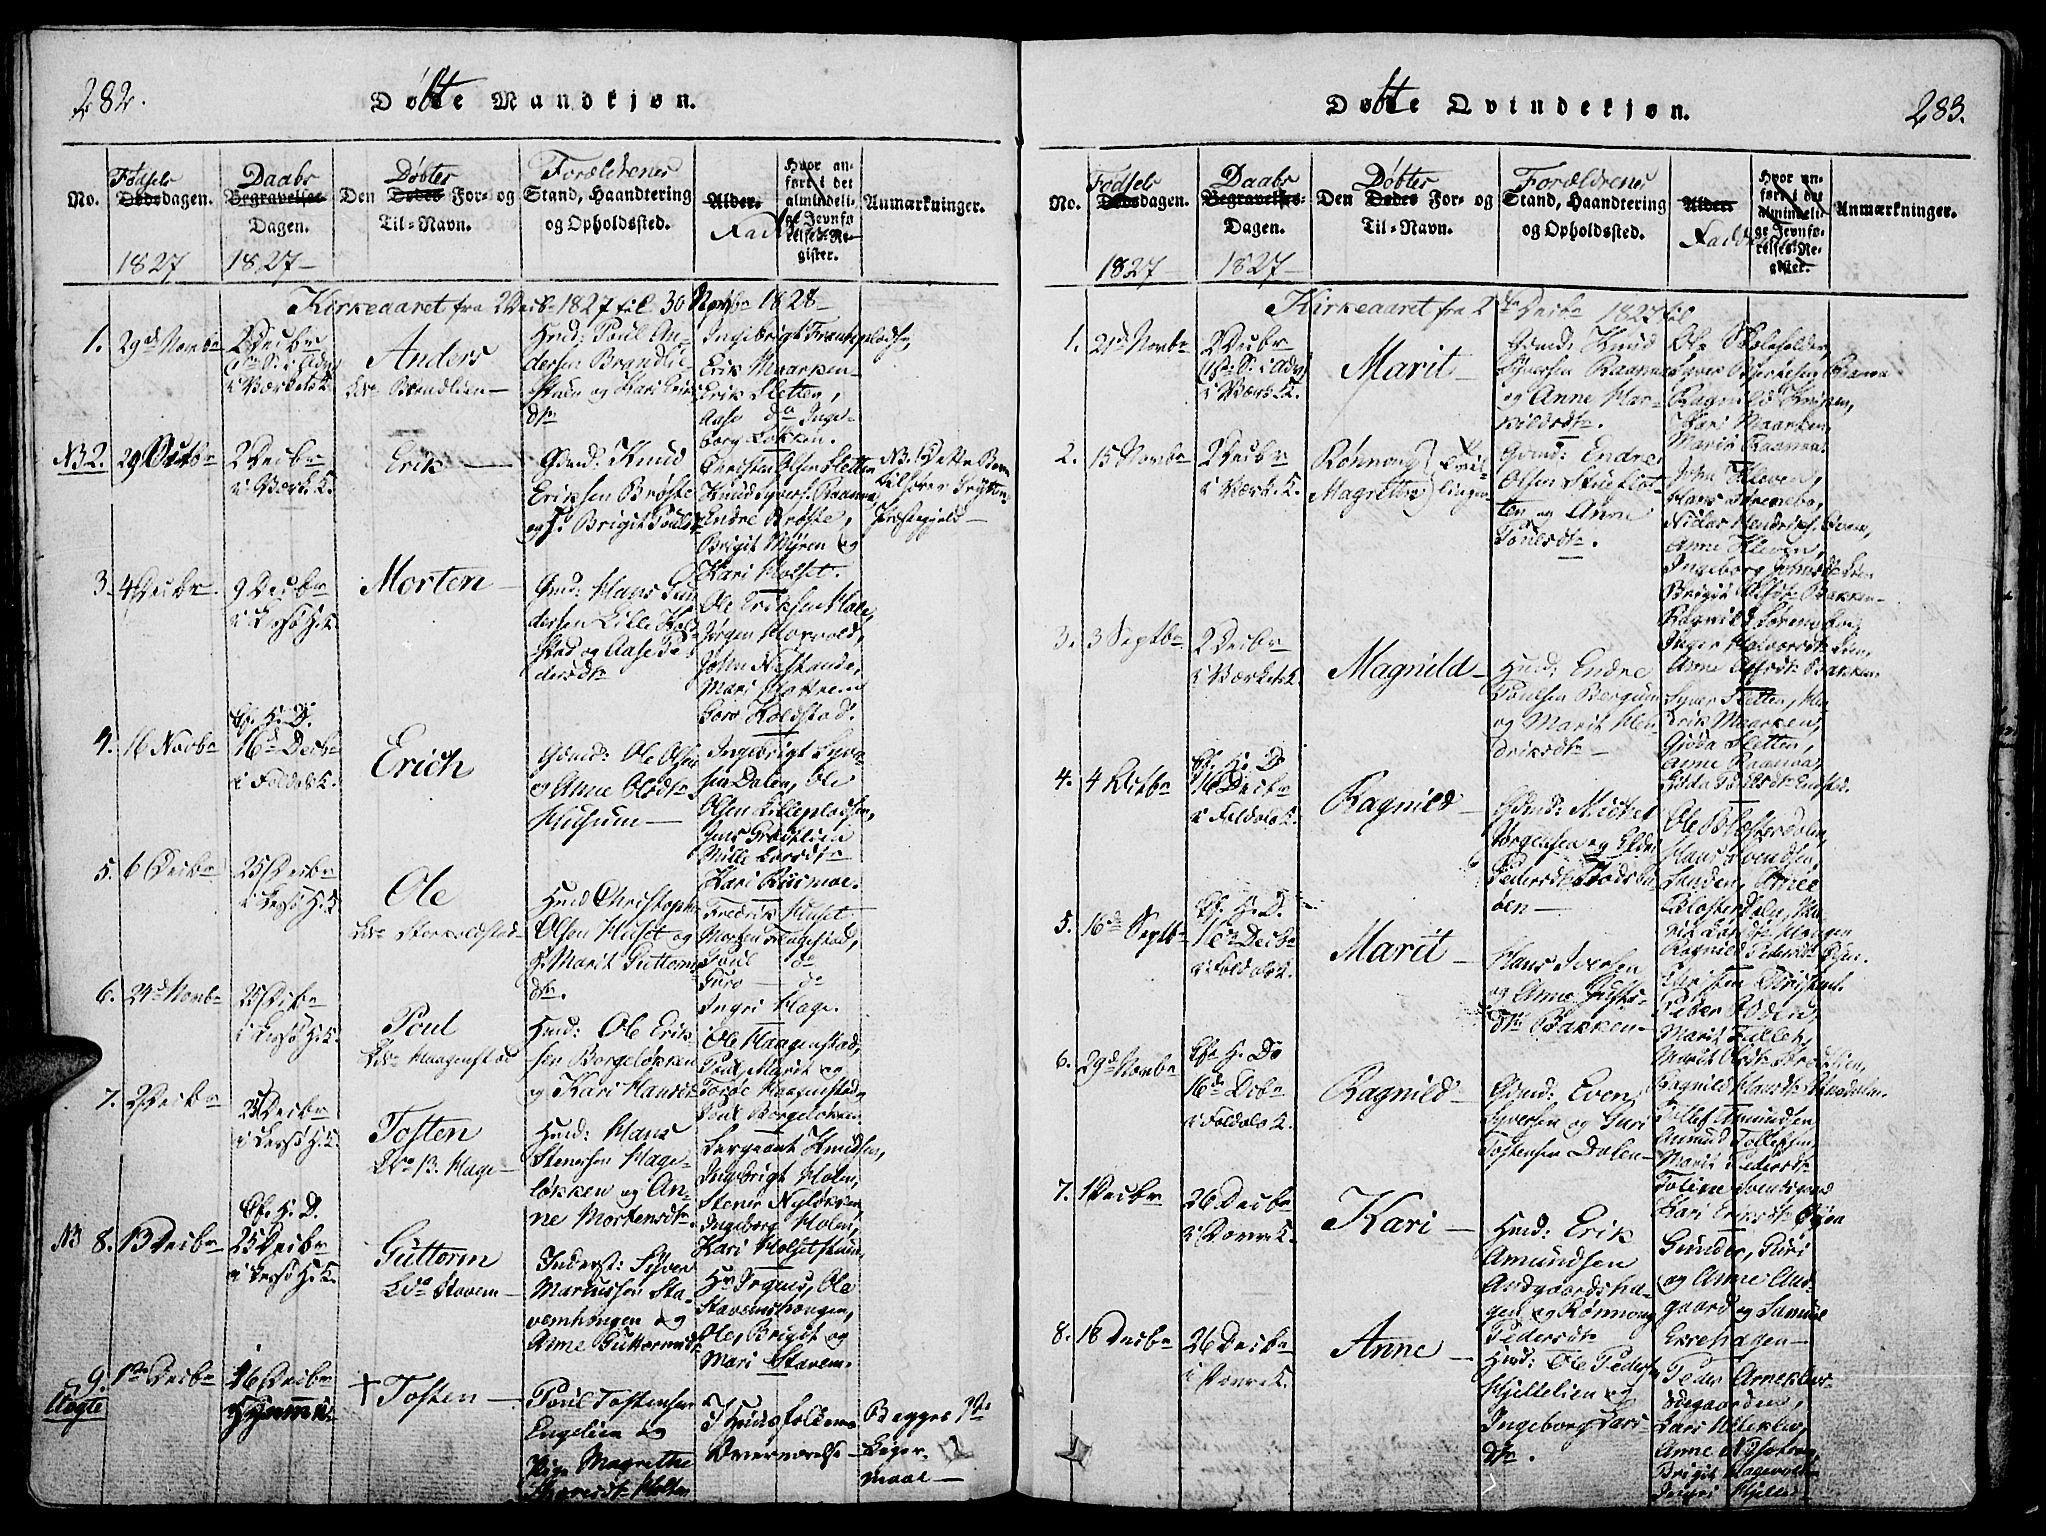 SAH, Lesja prestekontor, Ministerialbok nr. 4, 1820-1829, s. 282-283